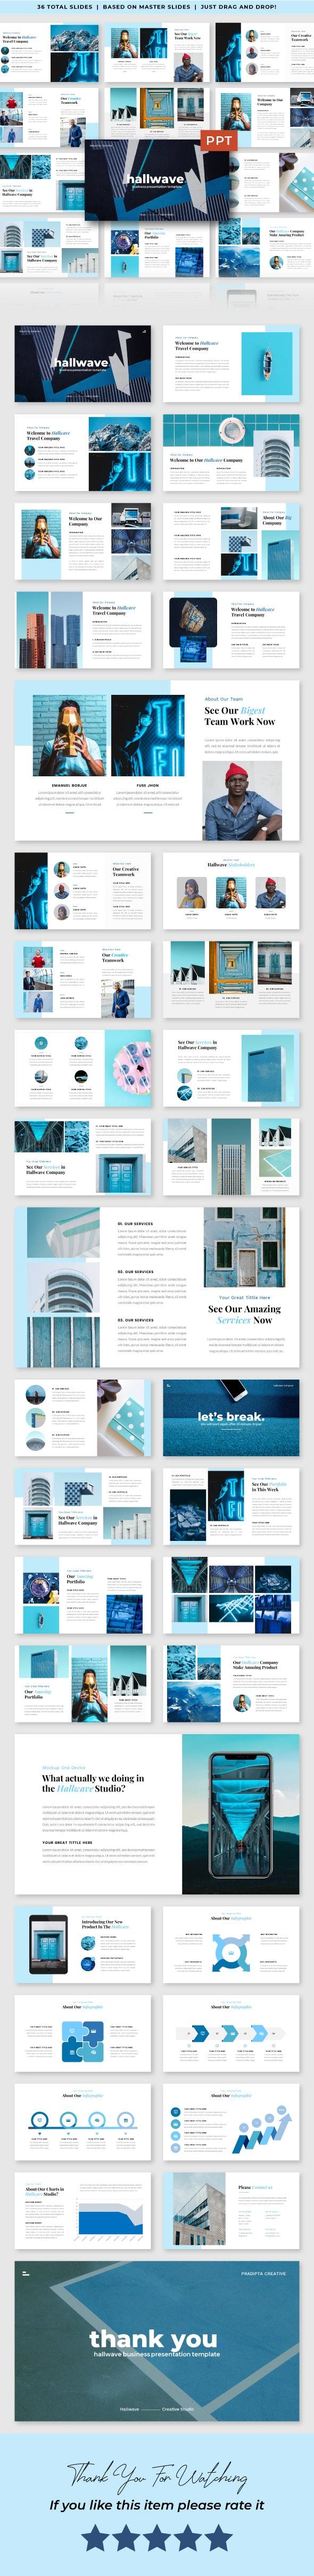 Hallwave - Business PowerPoint Template - Business PowerPoint Templates